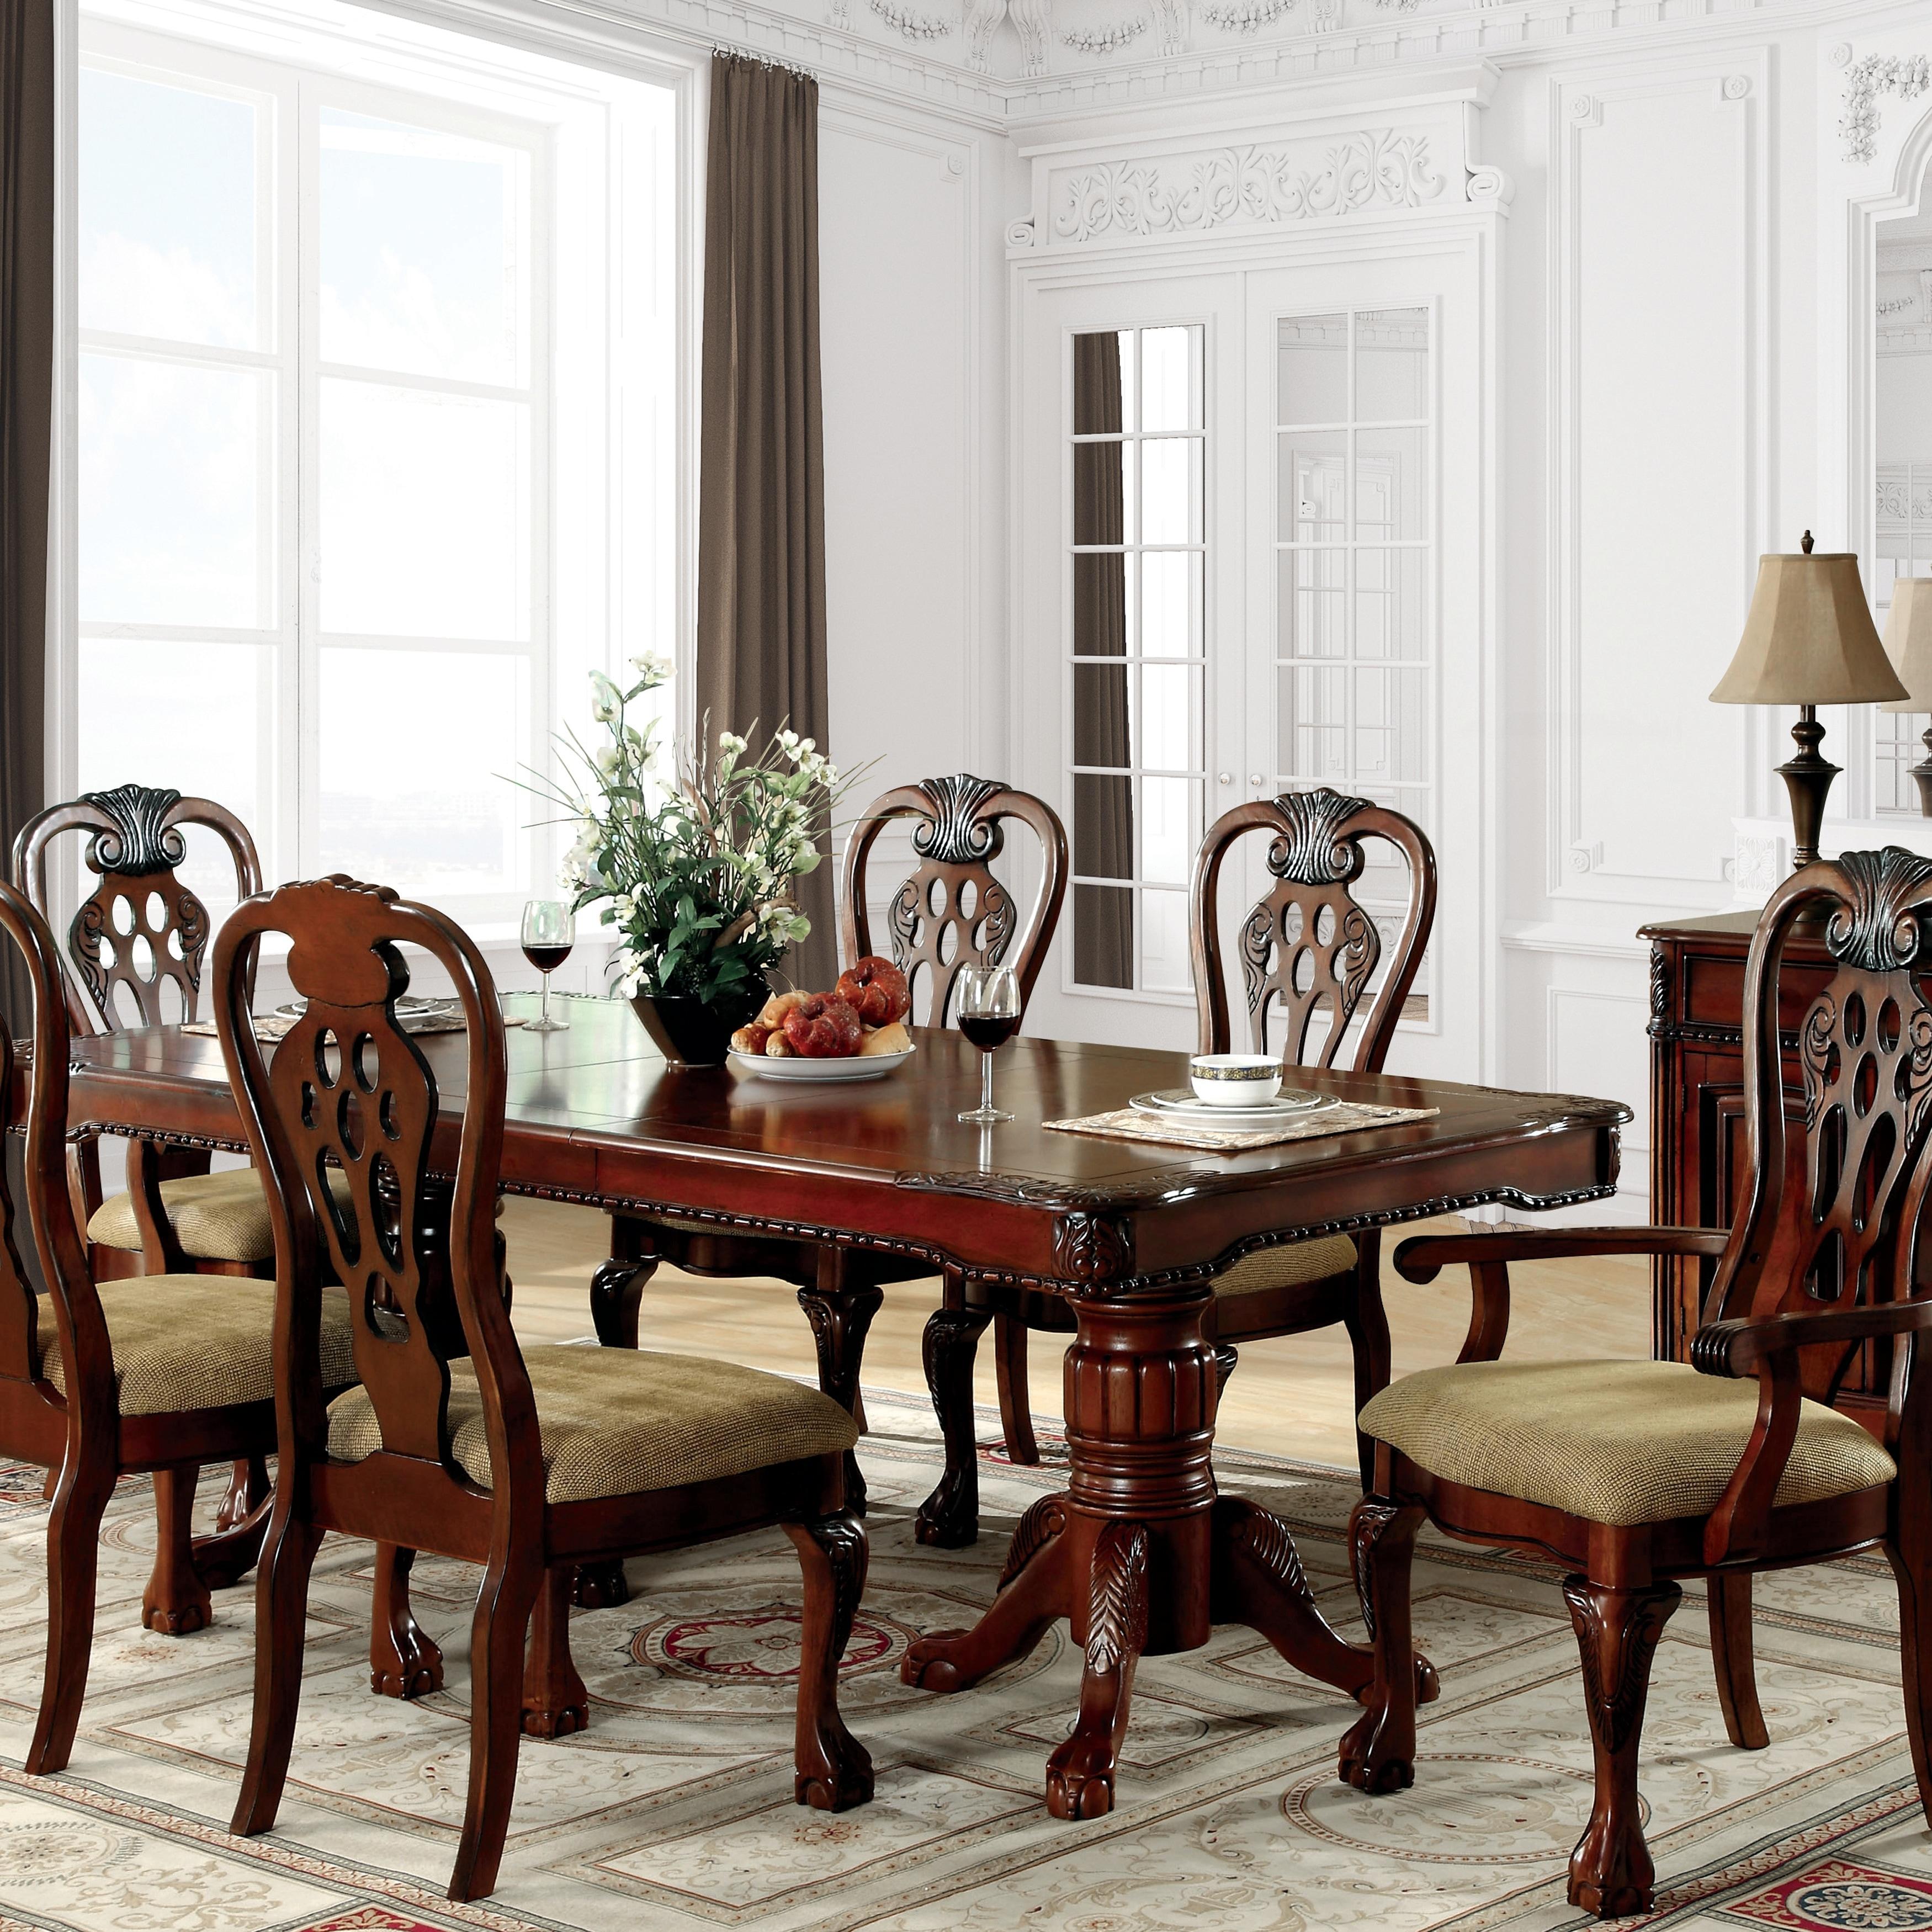 Furniture Of America Harper 7 Piece Formal Cherry Dining Set On Sale Overstock 20831060